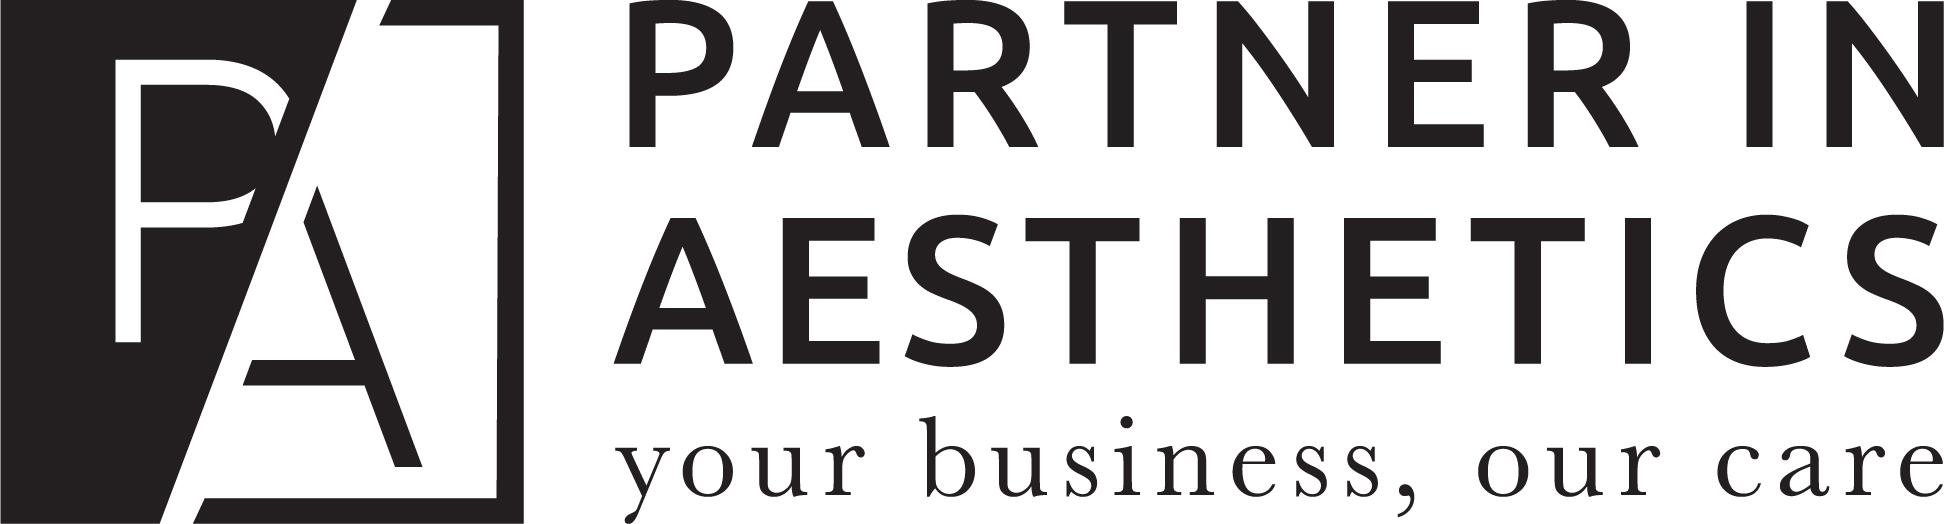 Partner in Aesthetics